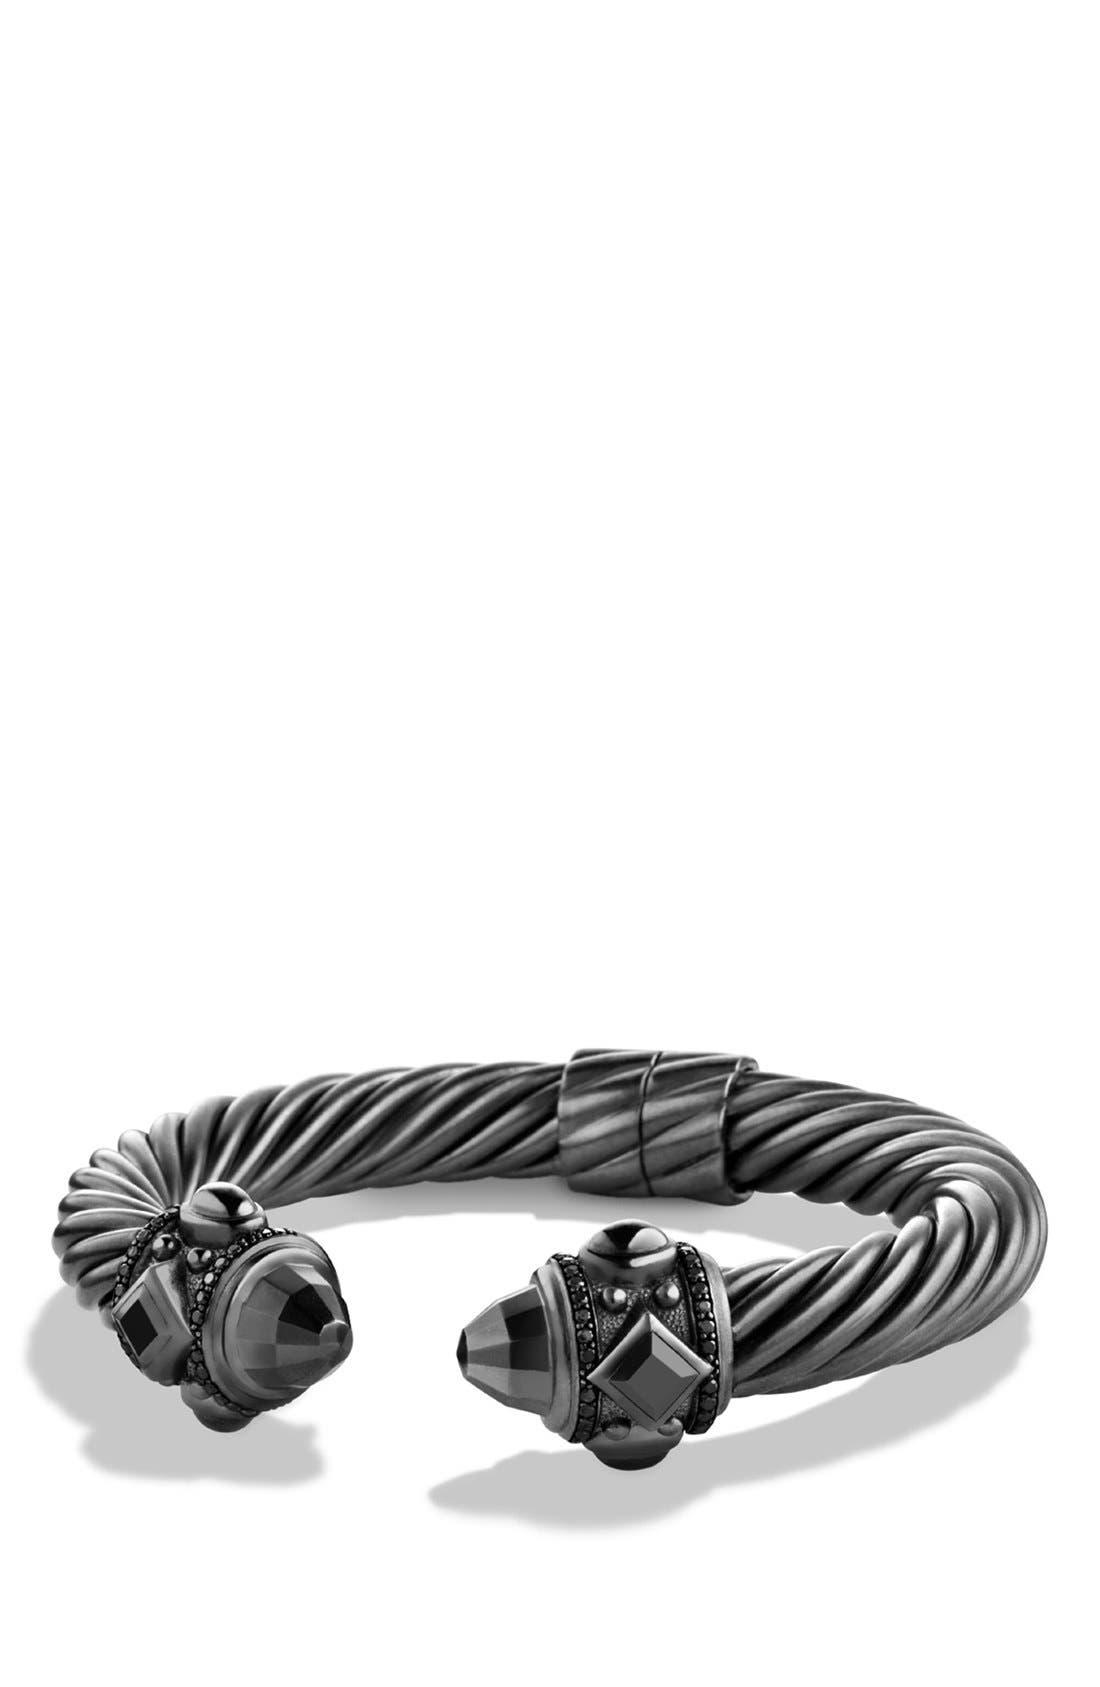 Main Image - David Yurman Renaissance Bracelet with Black Diamonds, 10mm